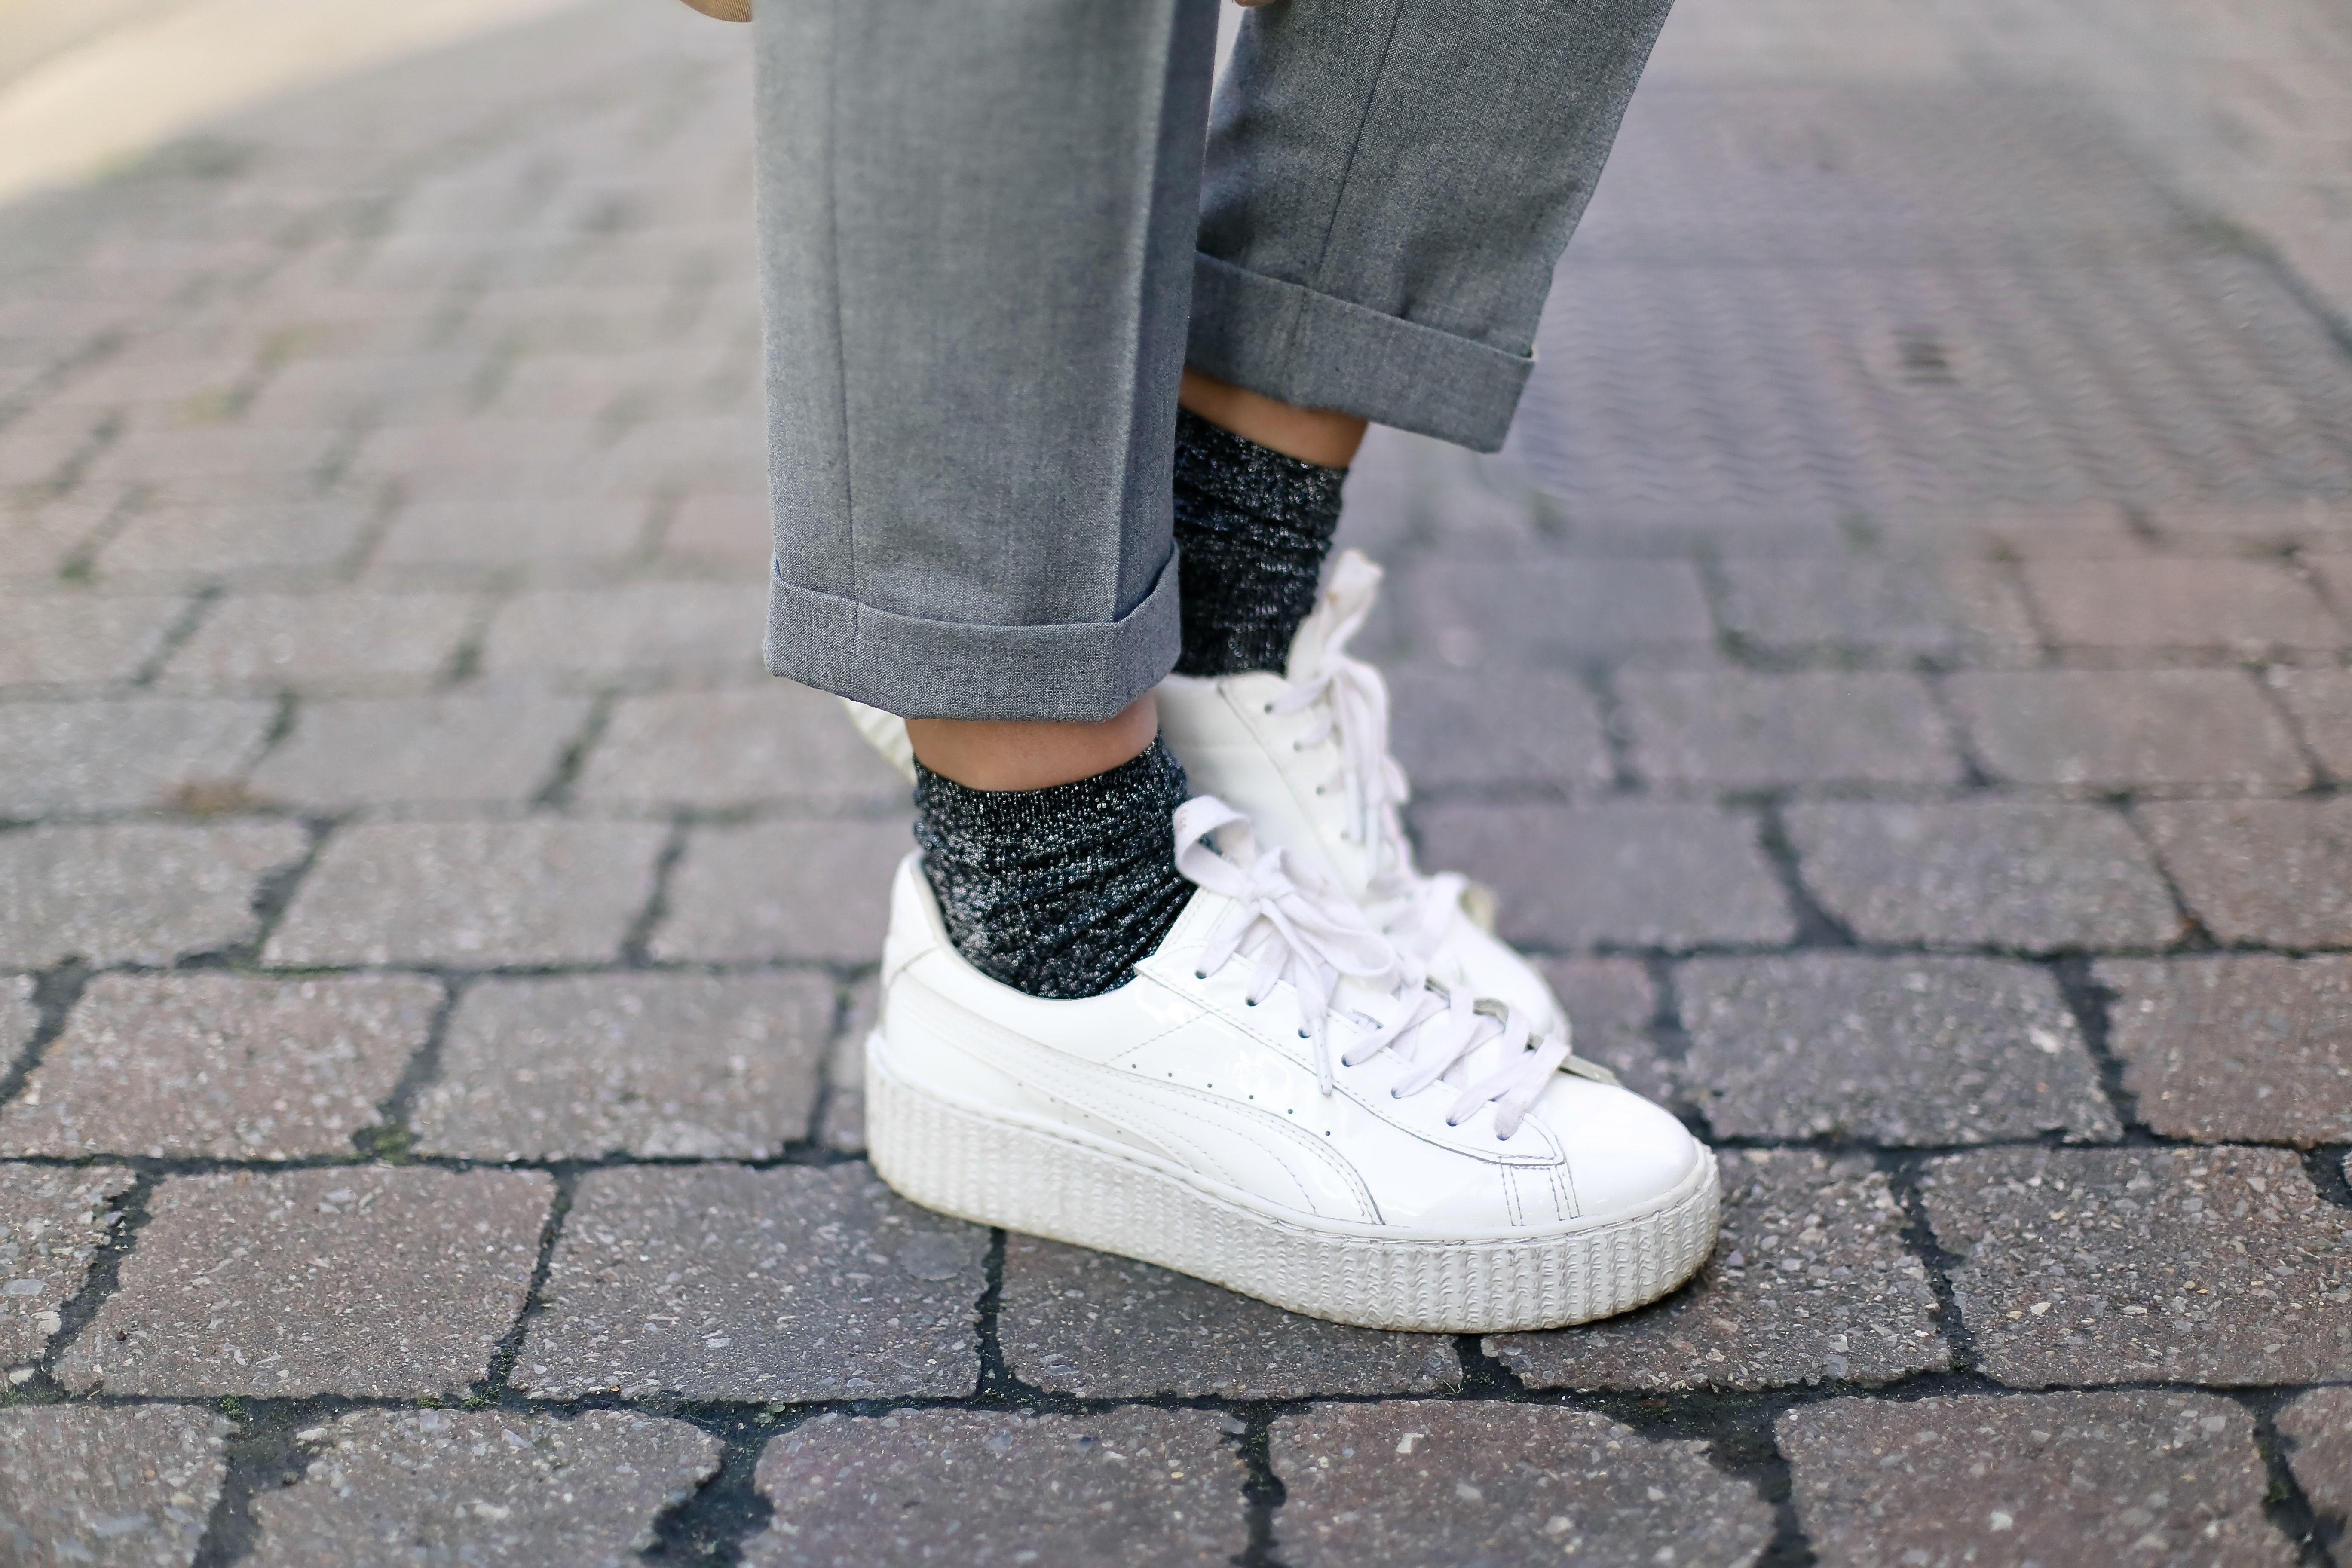 de1165e58126 puma creepers white and glitter socks